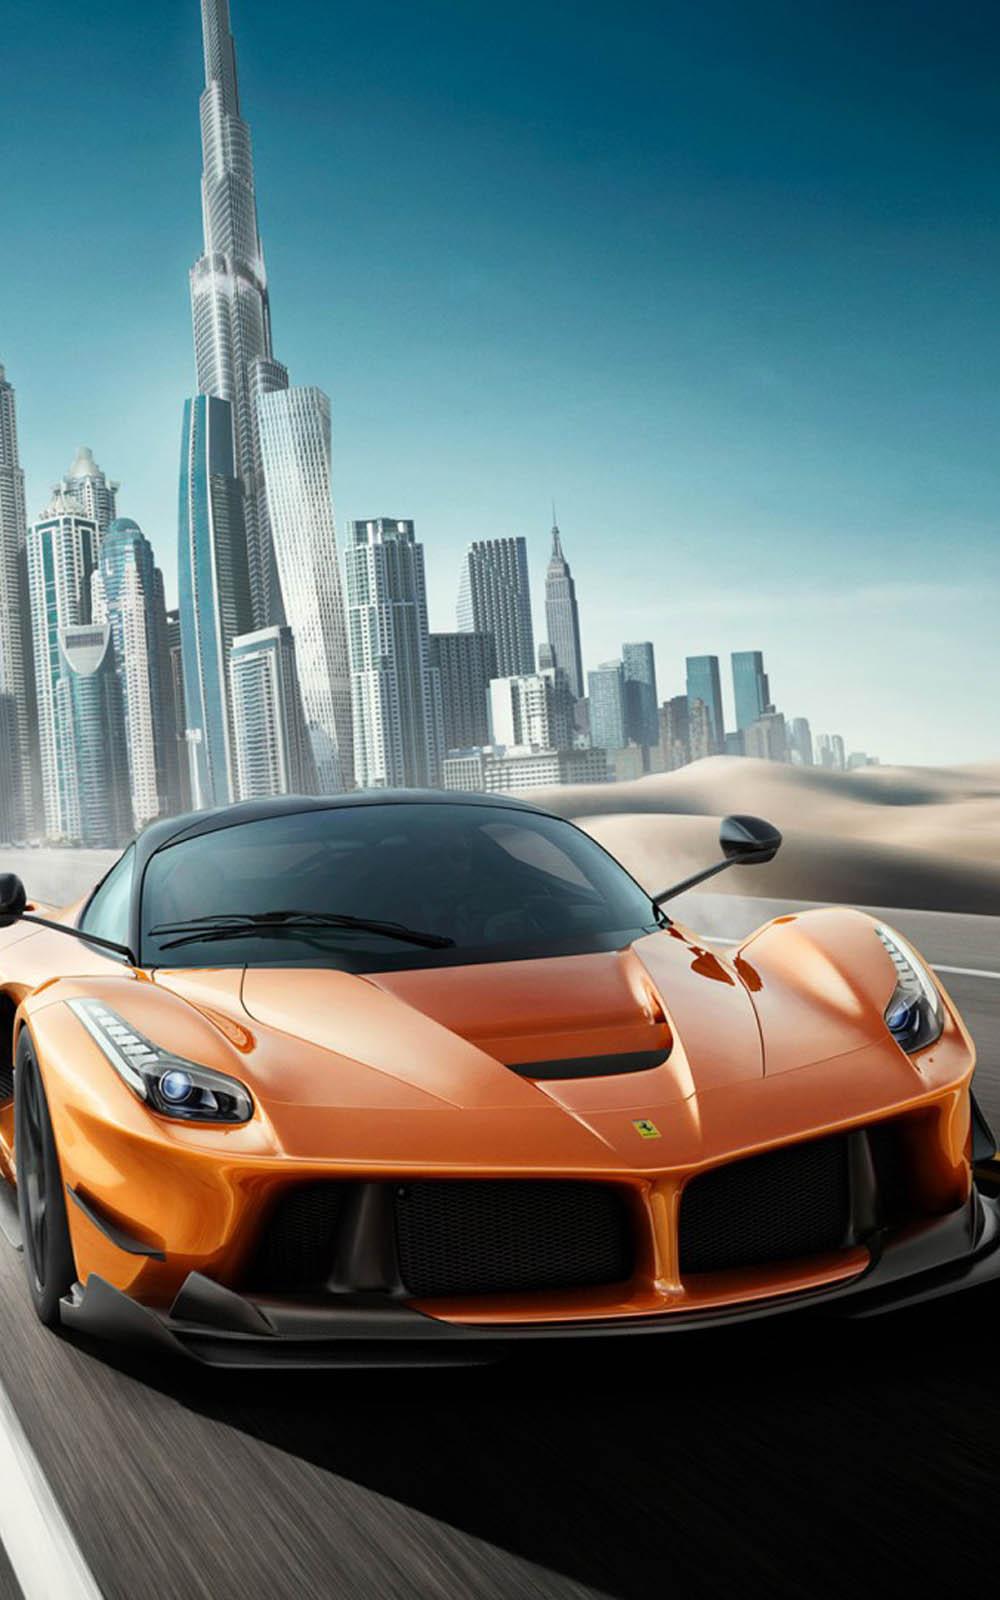 Download Speed Ferrari In Dubai Free Pure 4k Ultra Hd Mobile Wallpaper